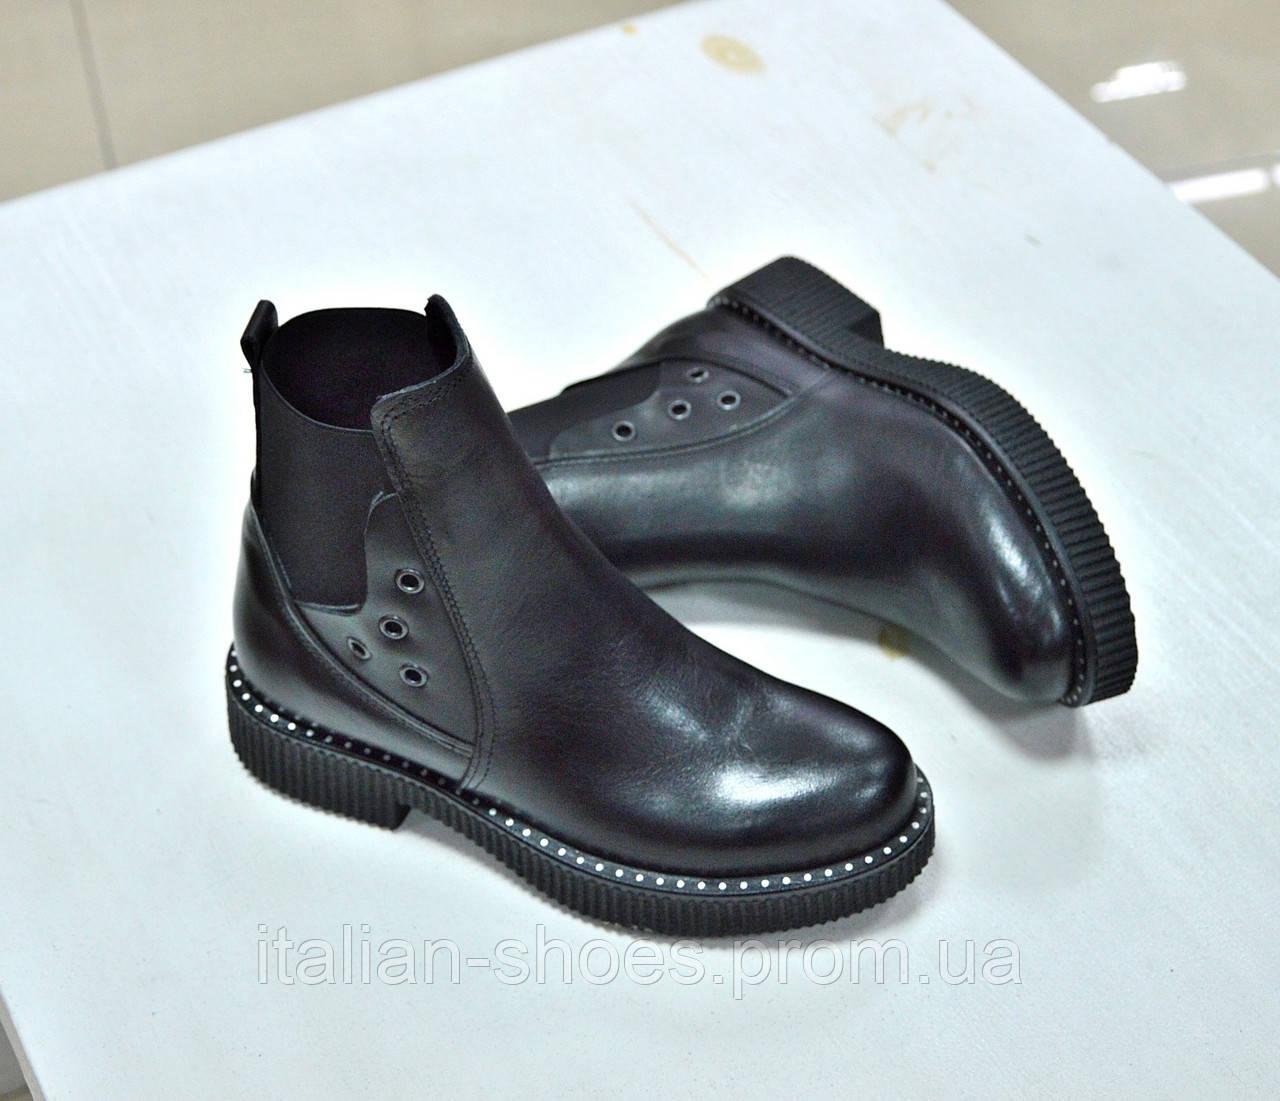 Ботинки Donna Italia к.-750